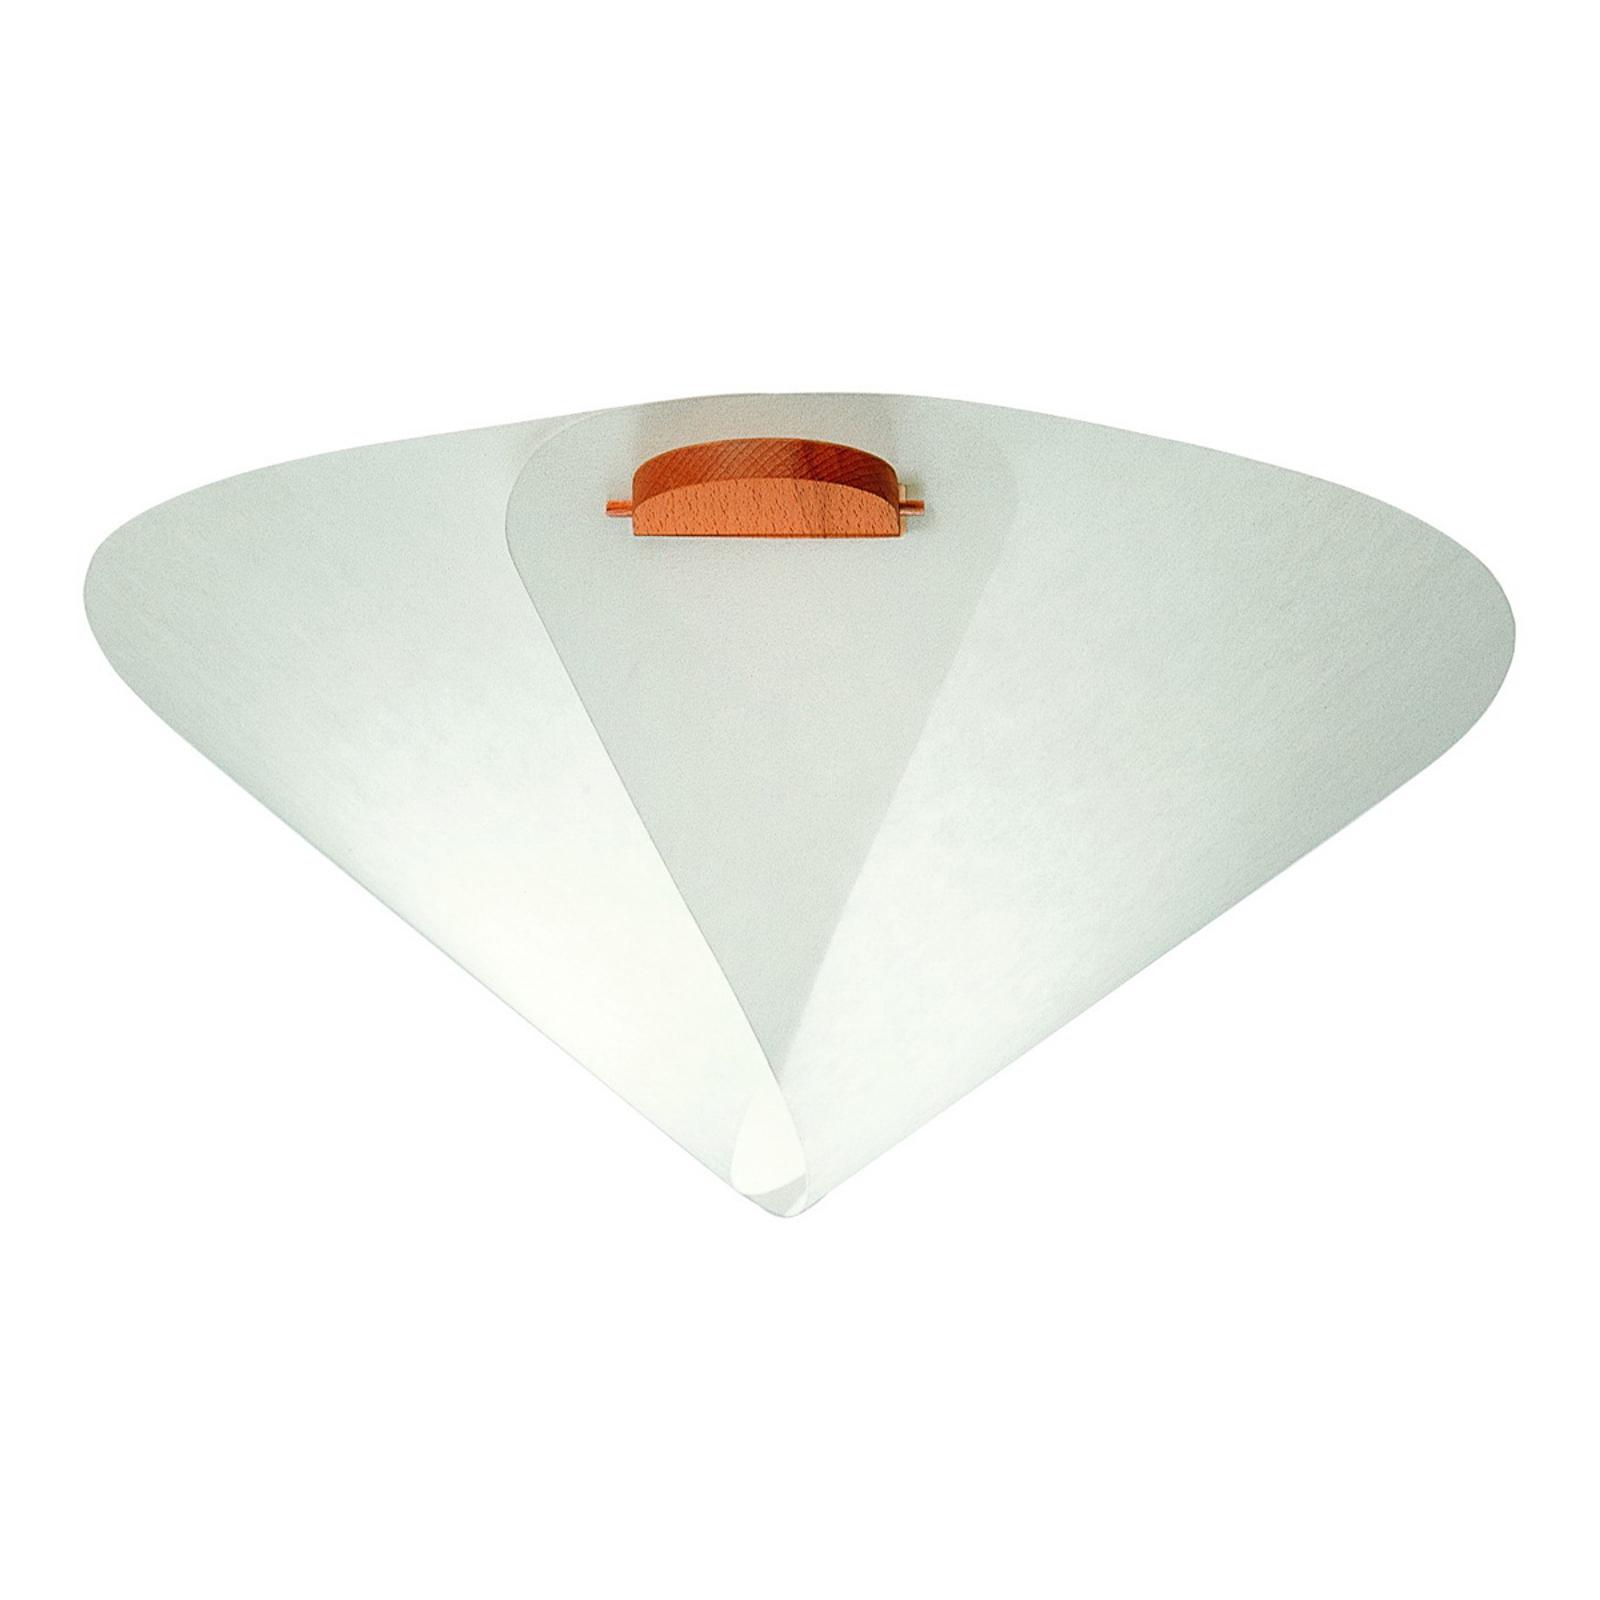 Cone-shaped Designer Ceiling light IRIS_2600035_1